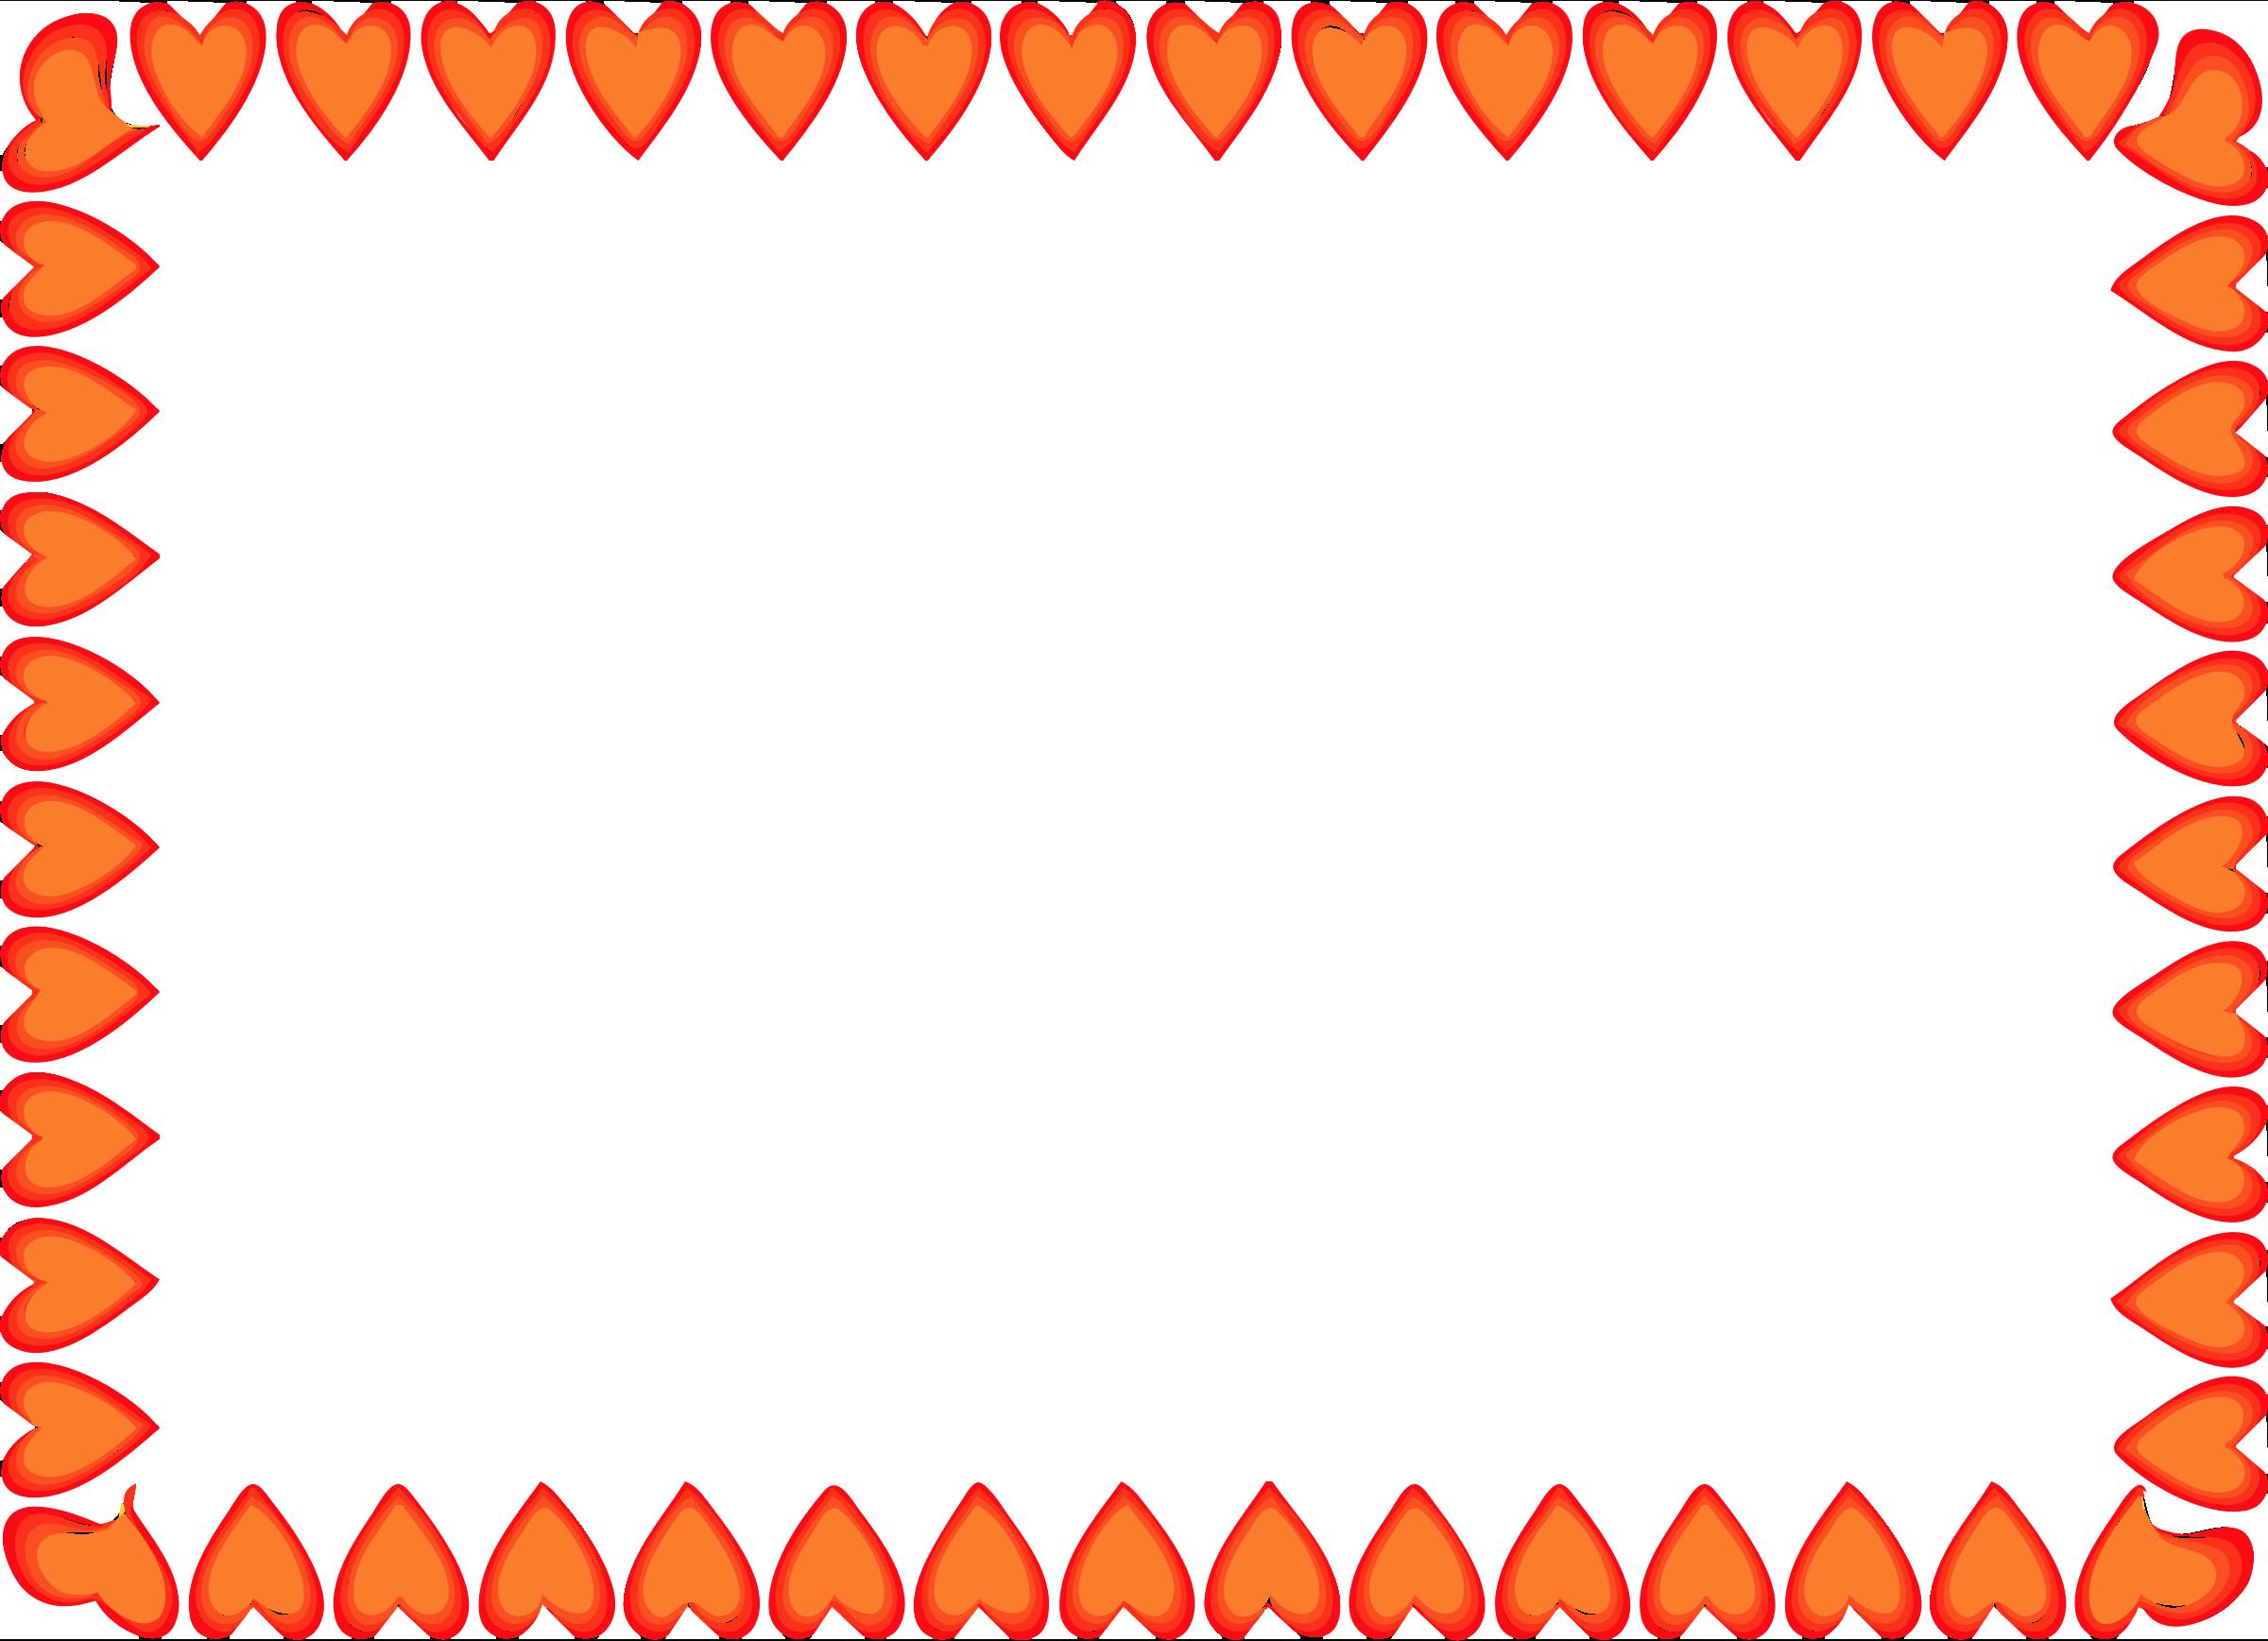 Border clipart horizontal. Heart letters format gclipart